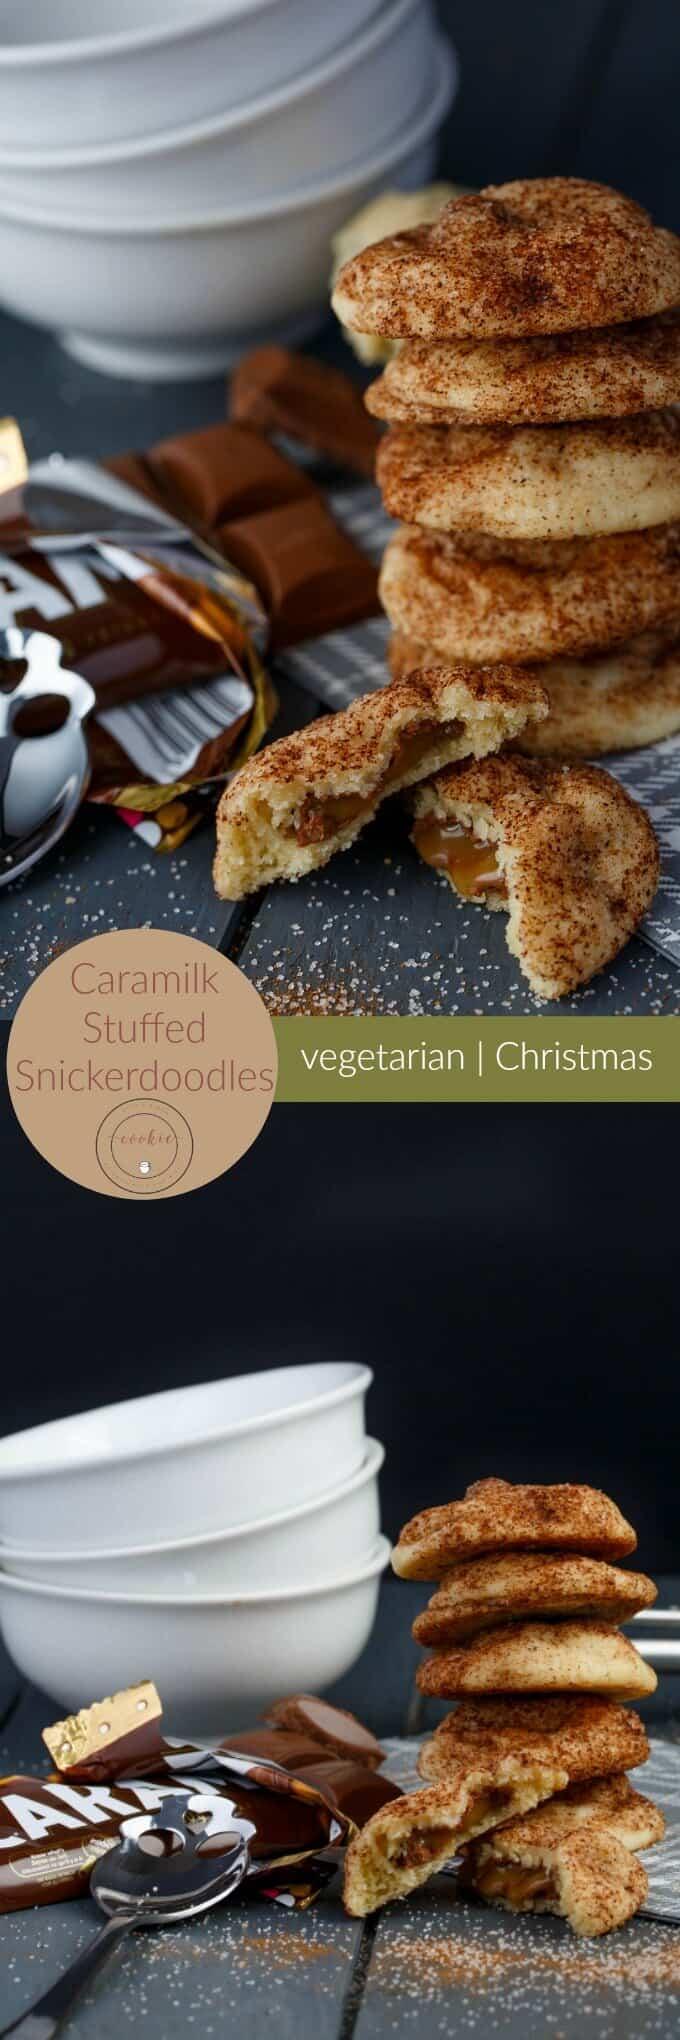 Caramilk Stuffed Snickerdoodles